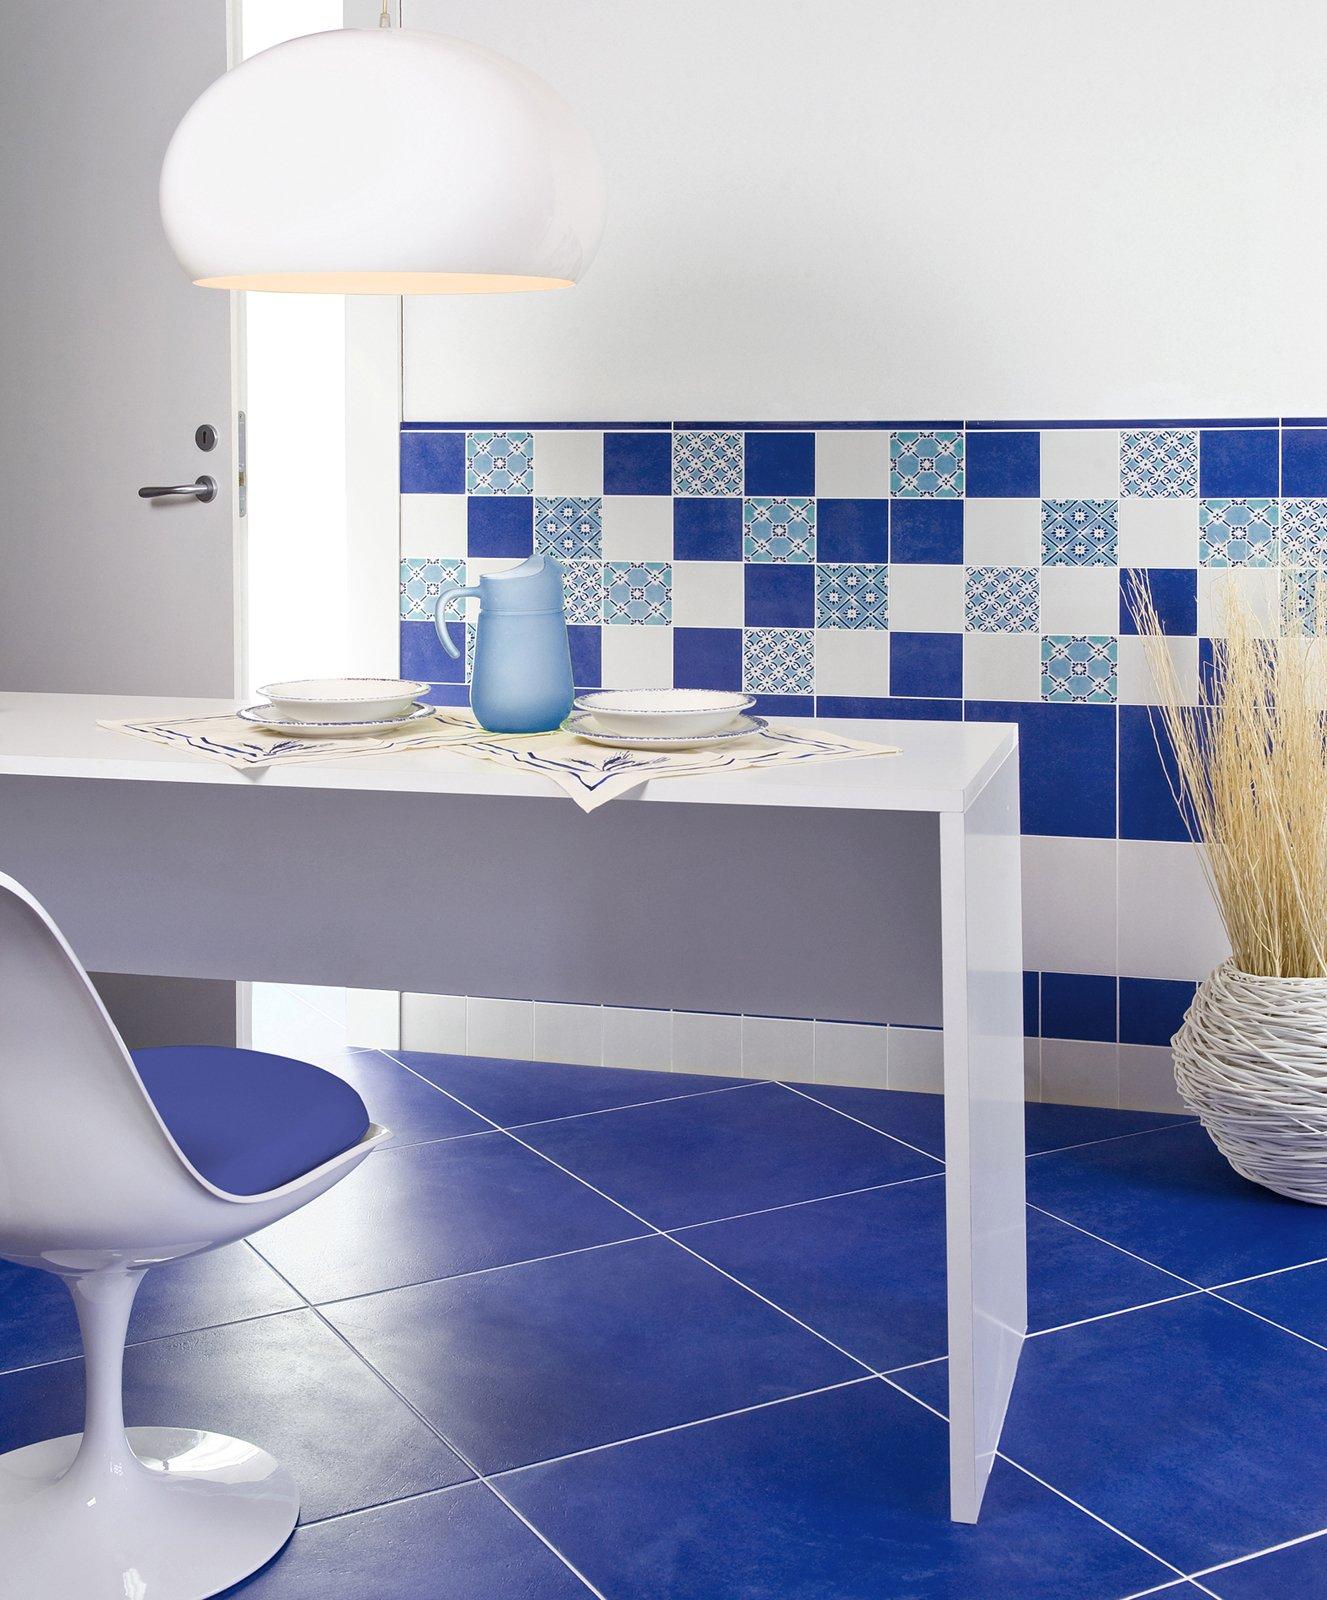 Cucina piastrelle per le pareti cose di casa - Piastrelle cucina ...